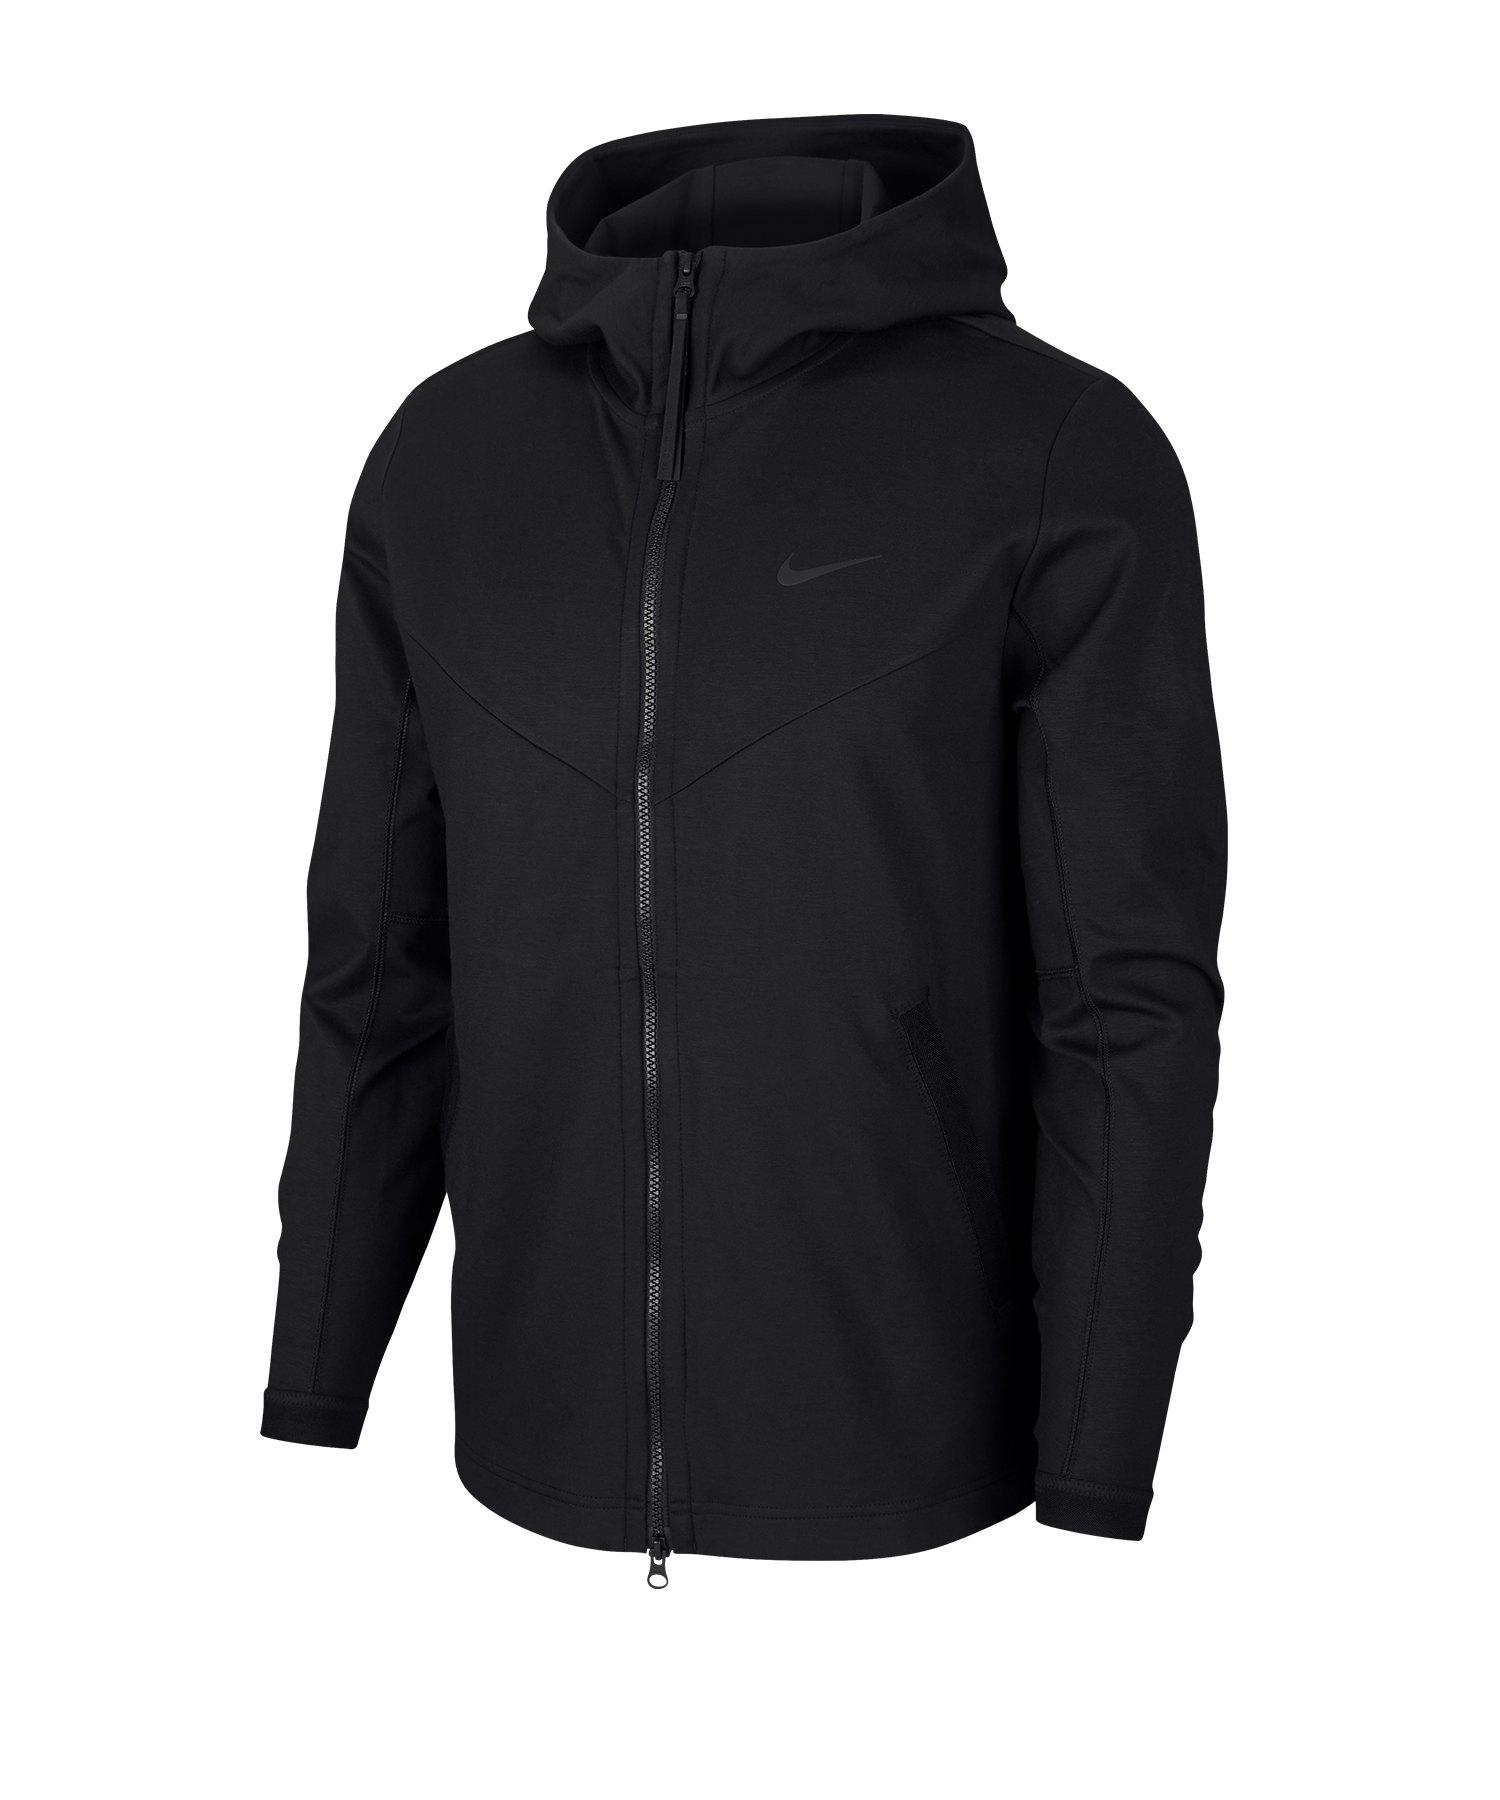 Nike Full-Zip Hooded Jacke Schwarz F010 - schwarz